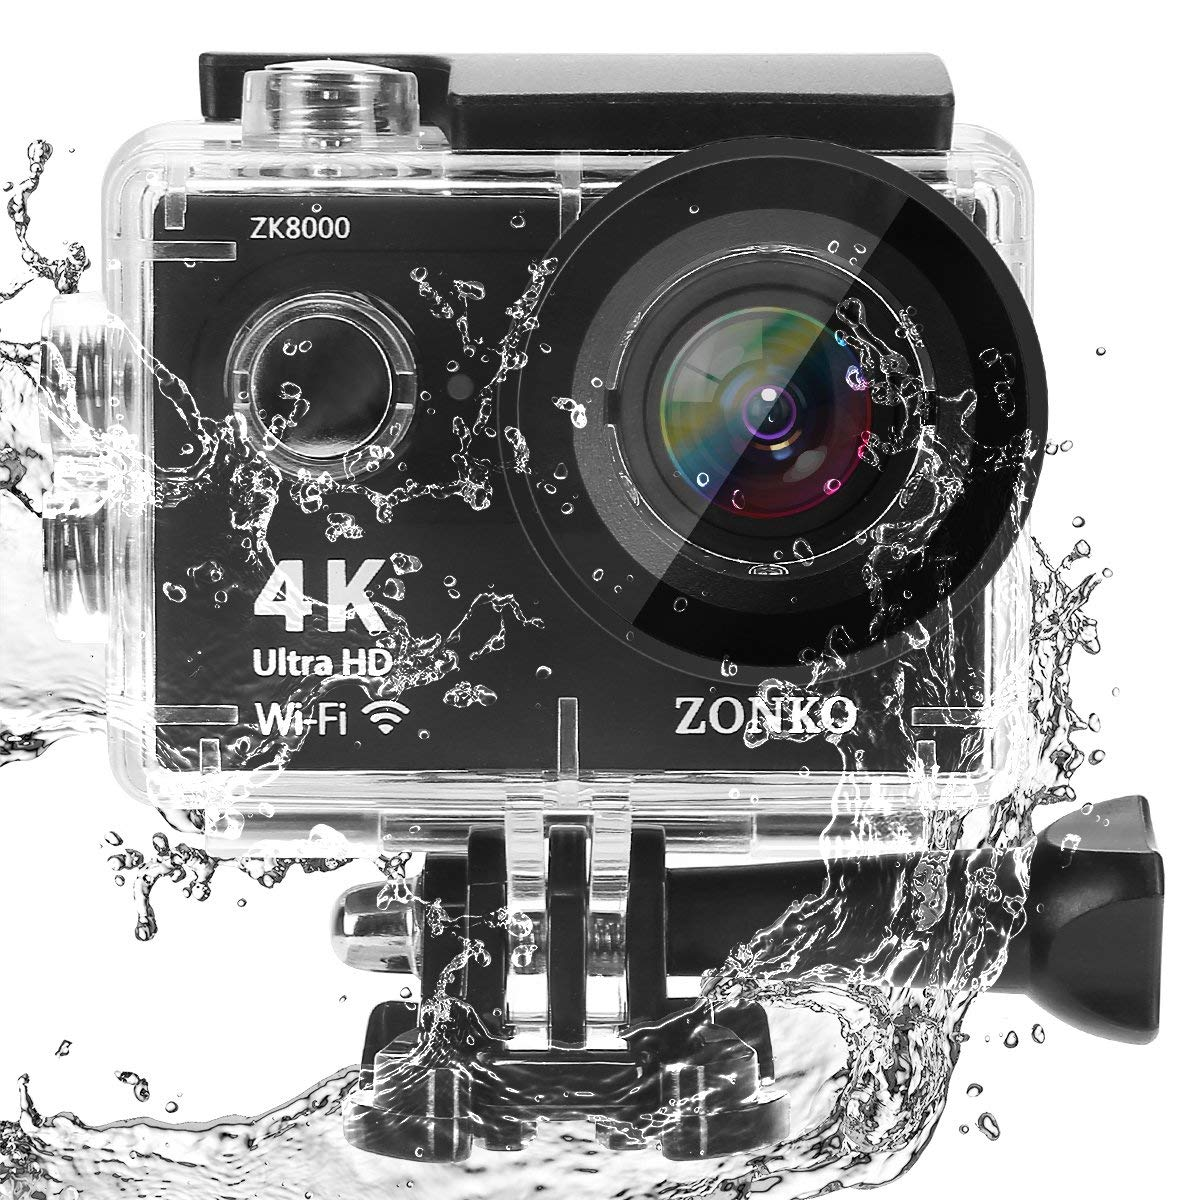 Action Camera ZONKO 4K Ultra HD WIFI Sports Camera 12MP 170 Degree Wide Angle Lens 30M Waterproof Camera for S